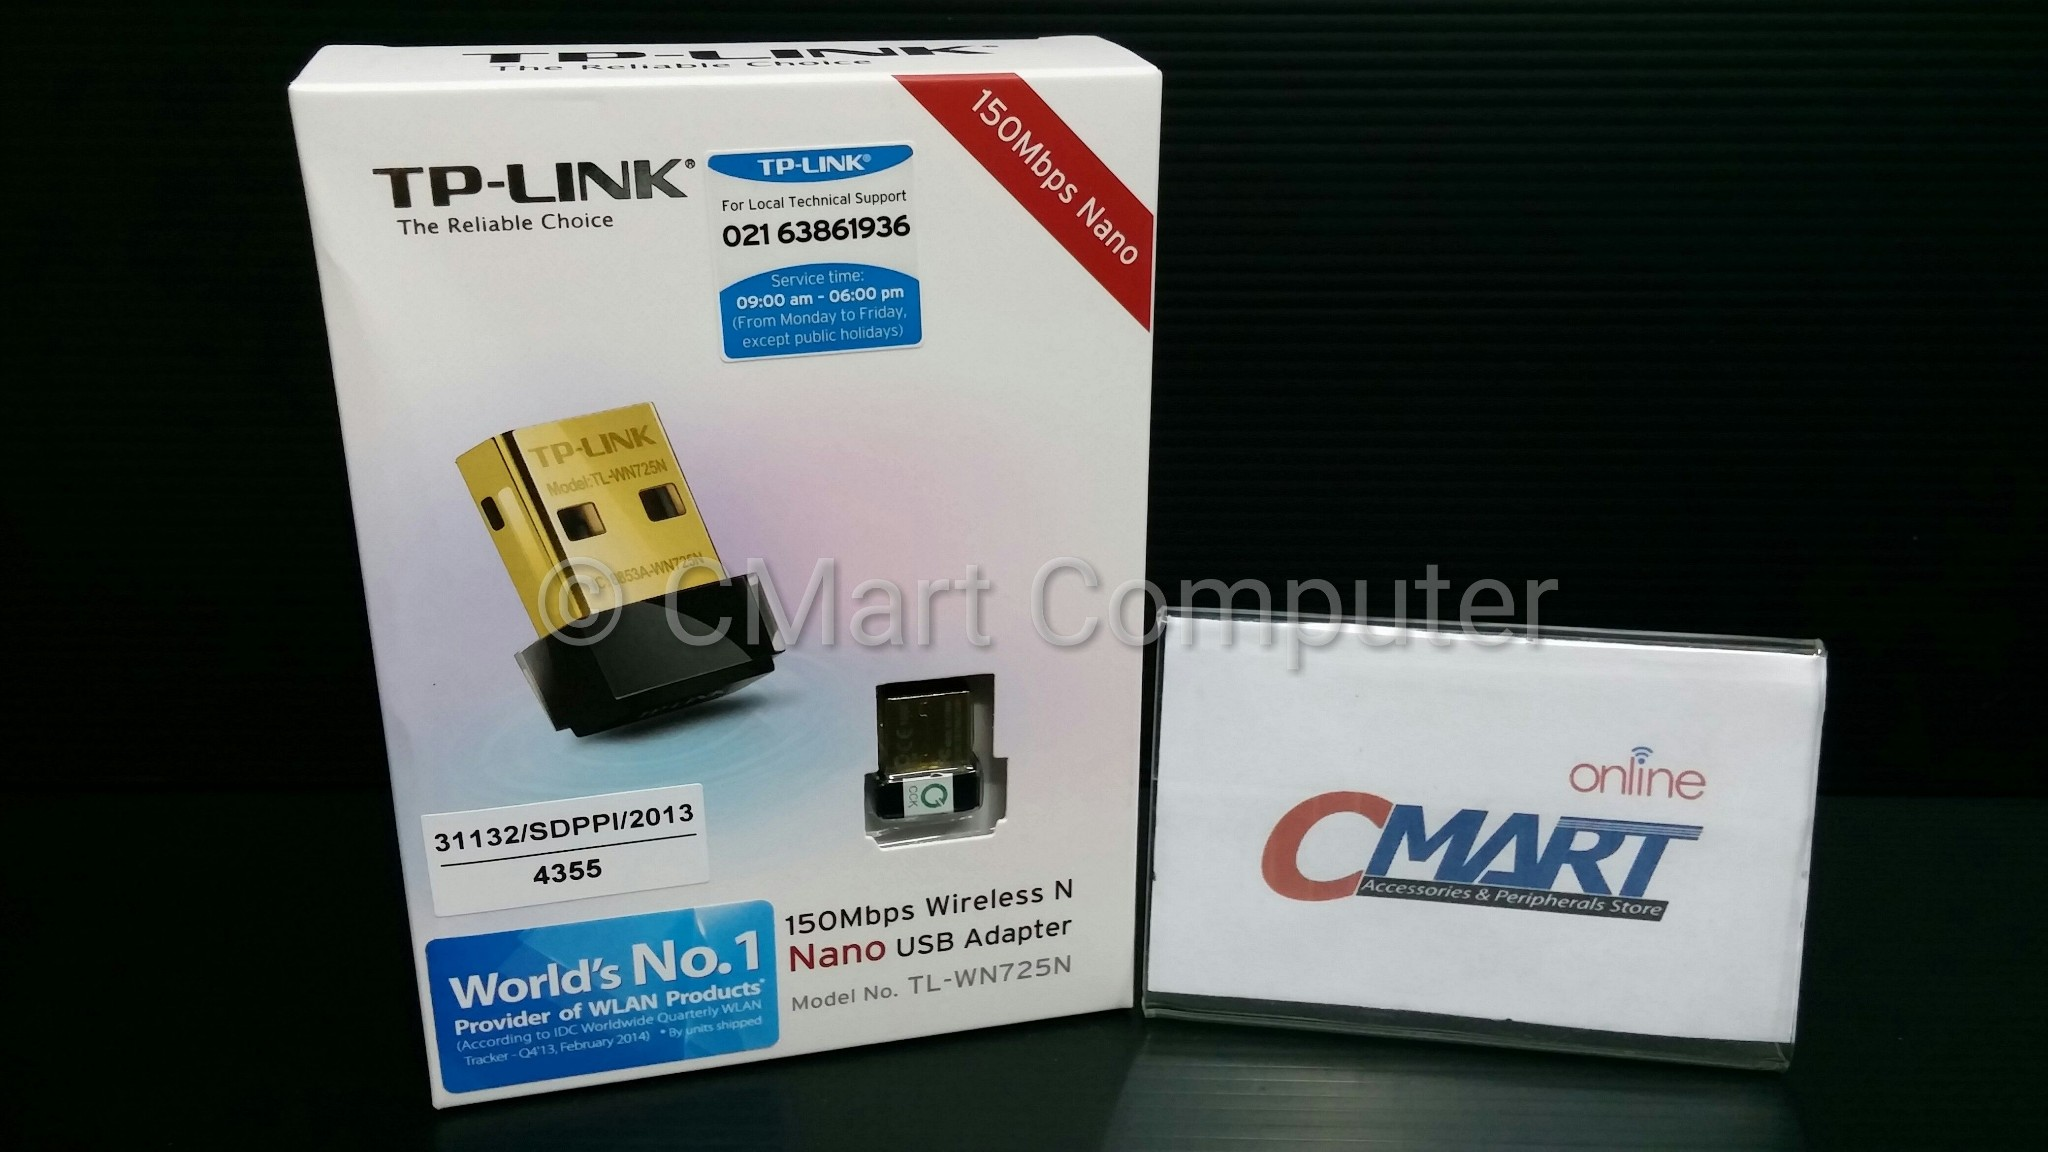 Jual Tp Link Tl Wn725n 150mbps Wireless N Nano Usb Adapter Cmart Wifi Computer Tokopedia